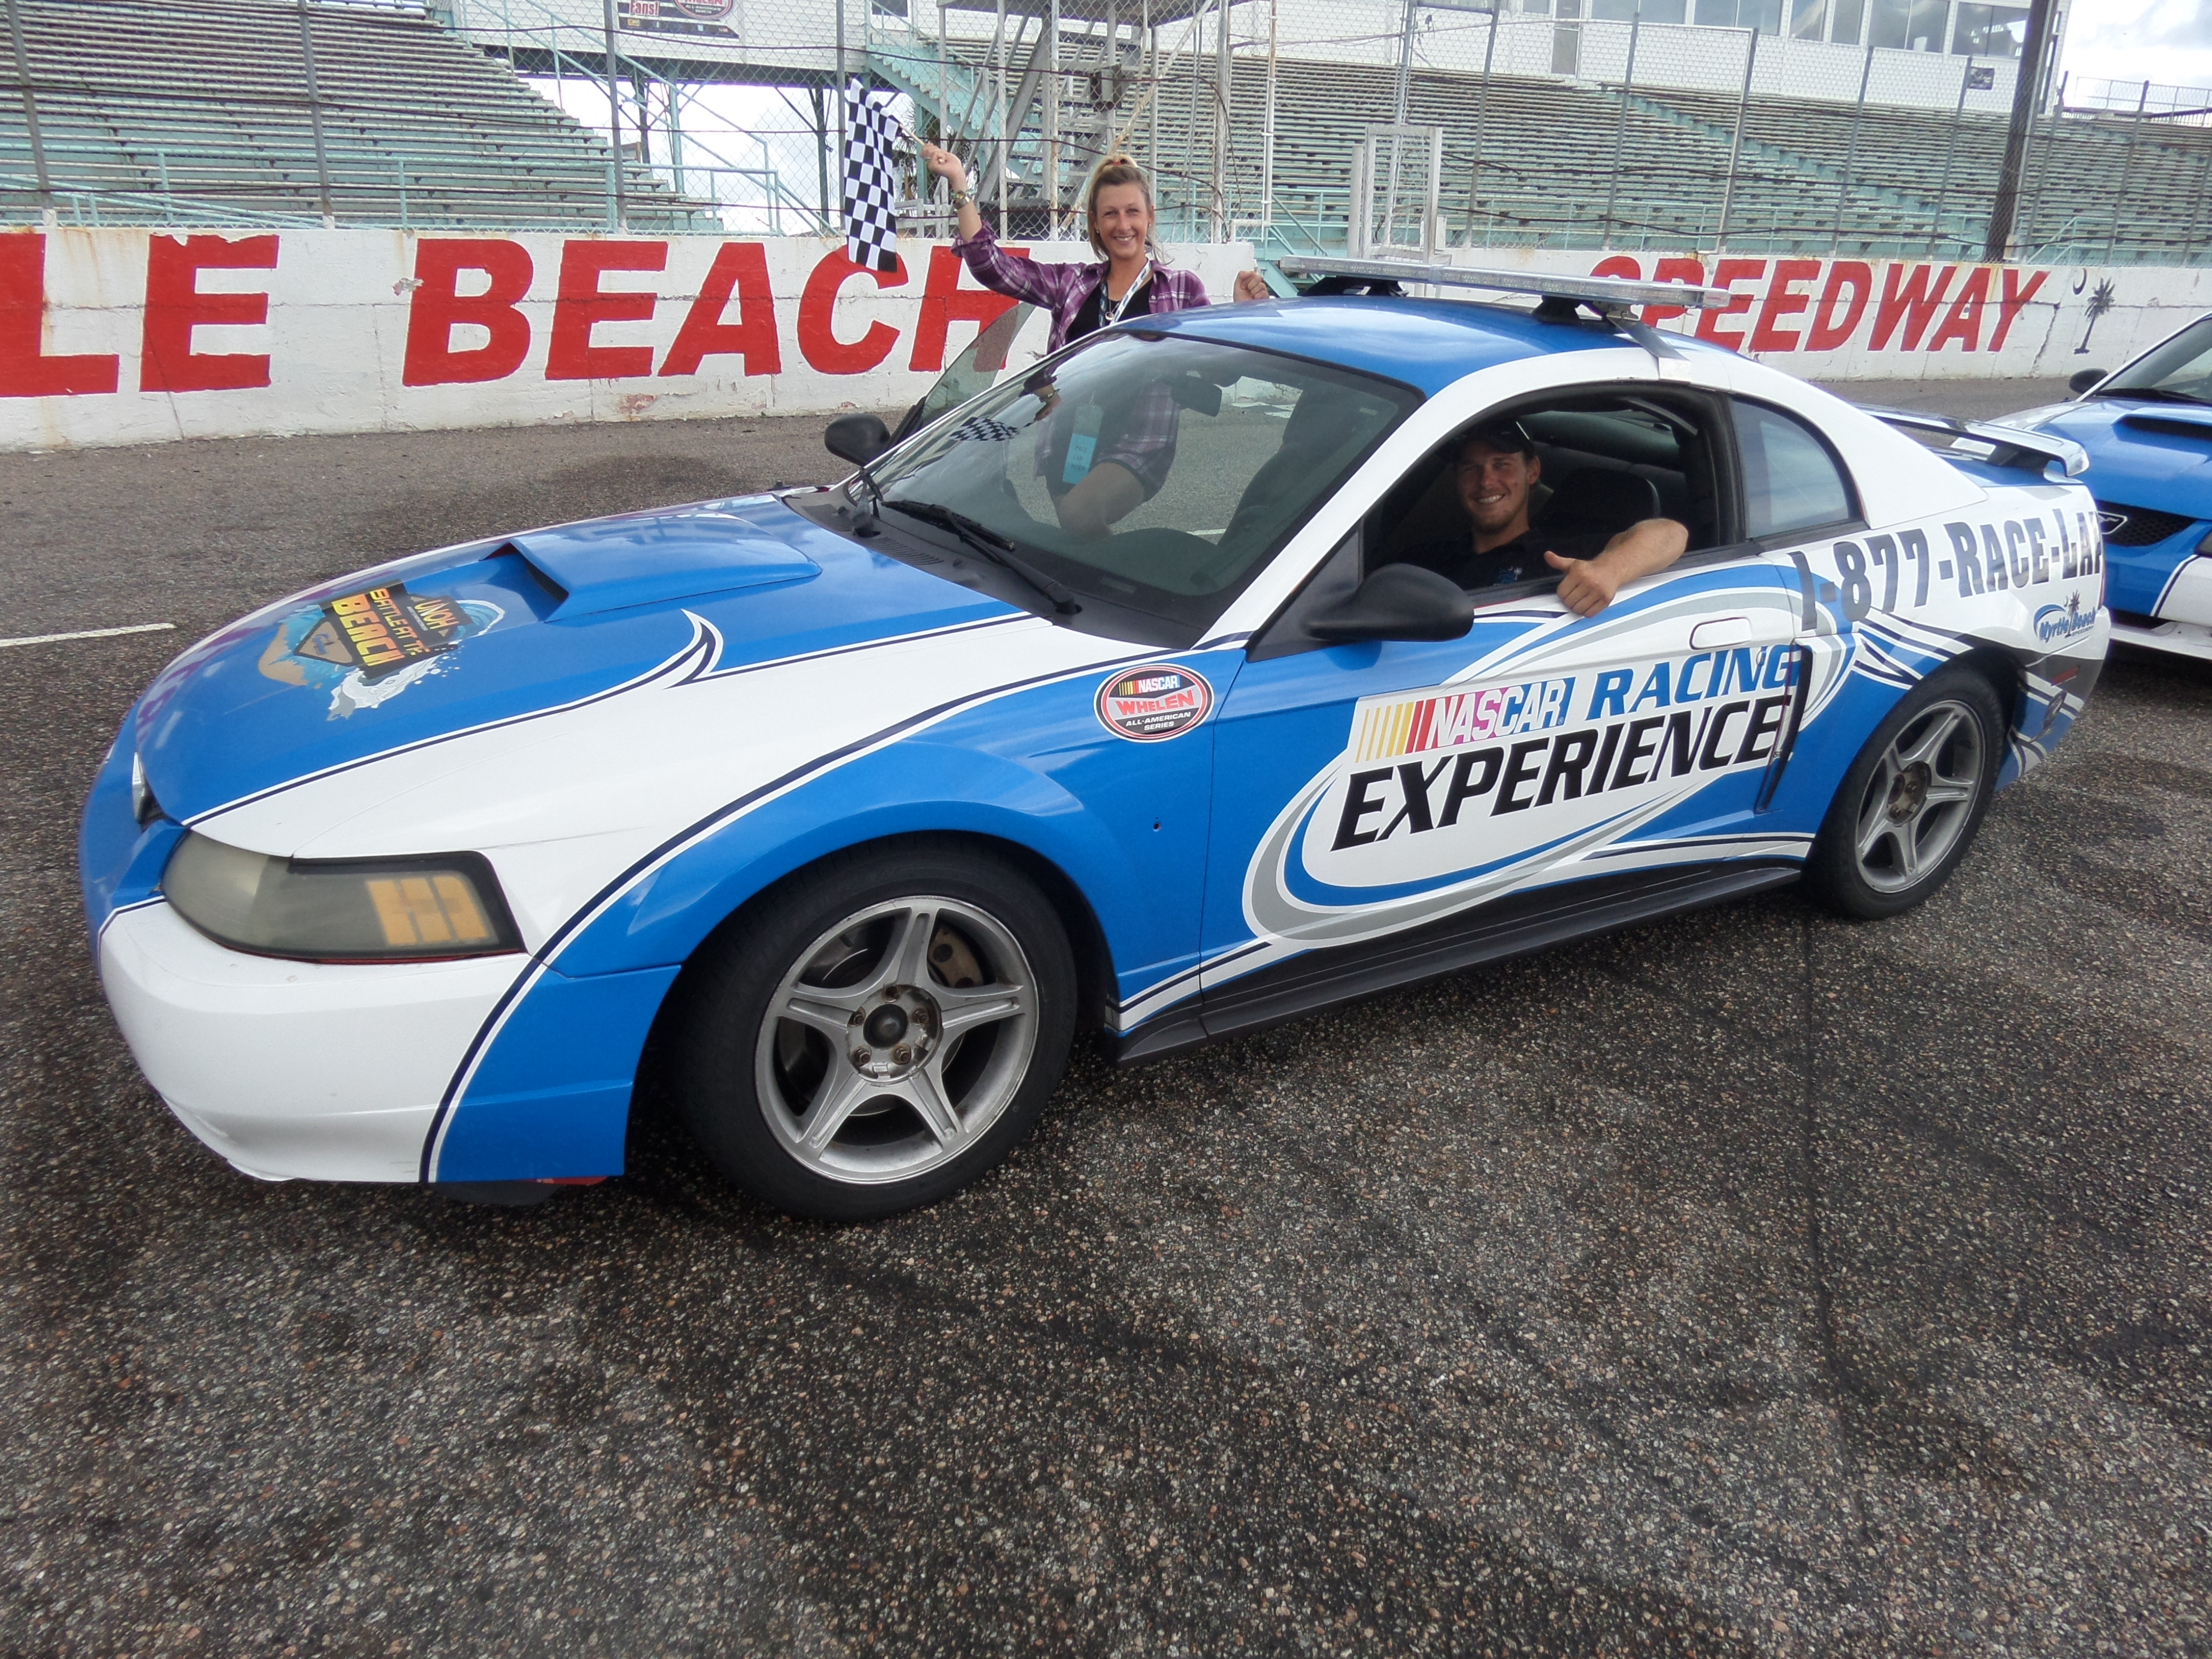 Myrtle Beach Speedway Nascar Racing Experience